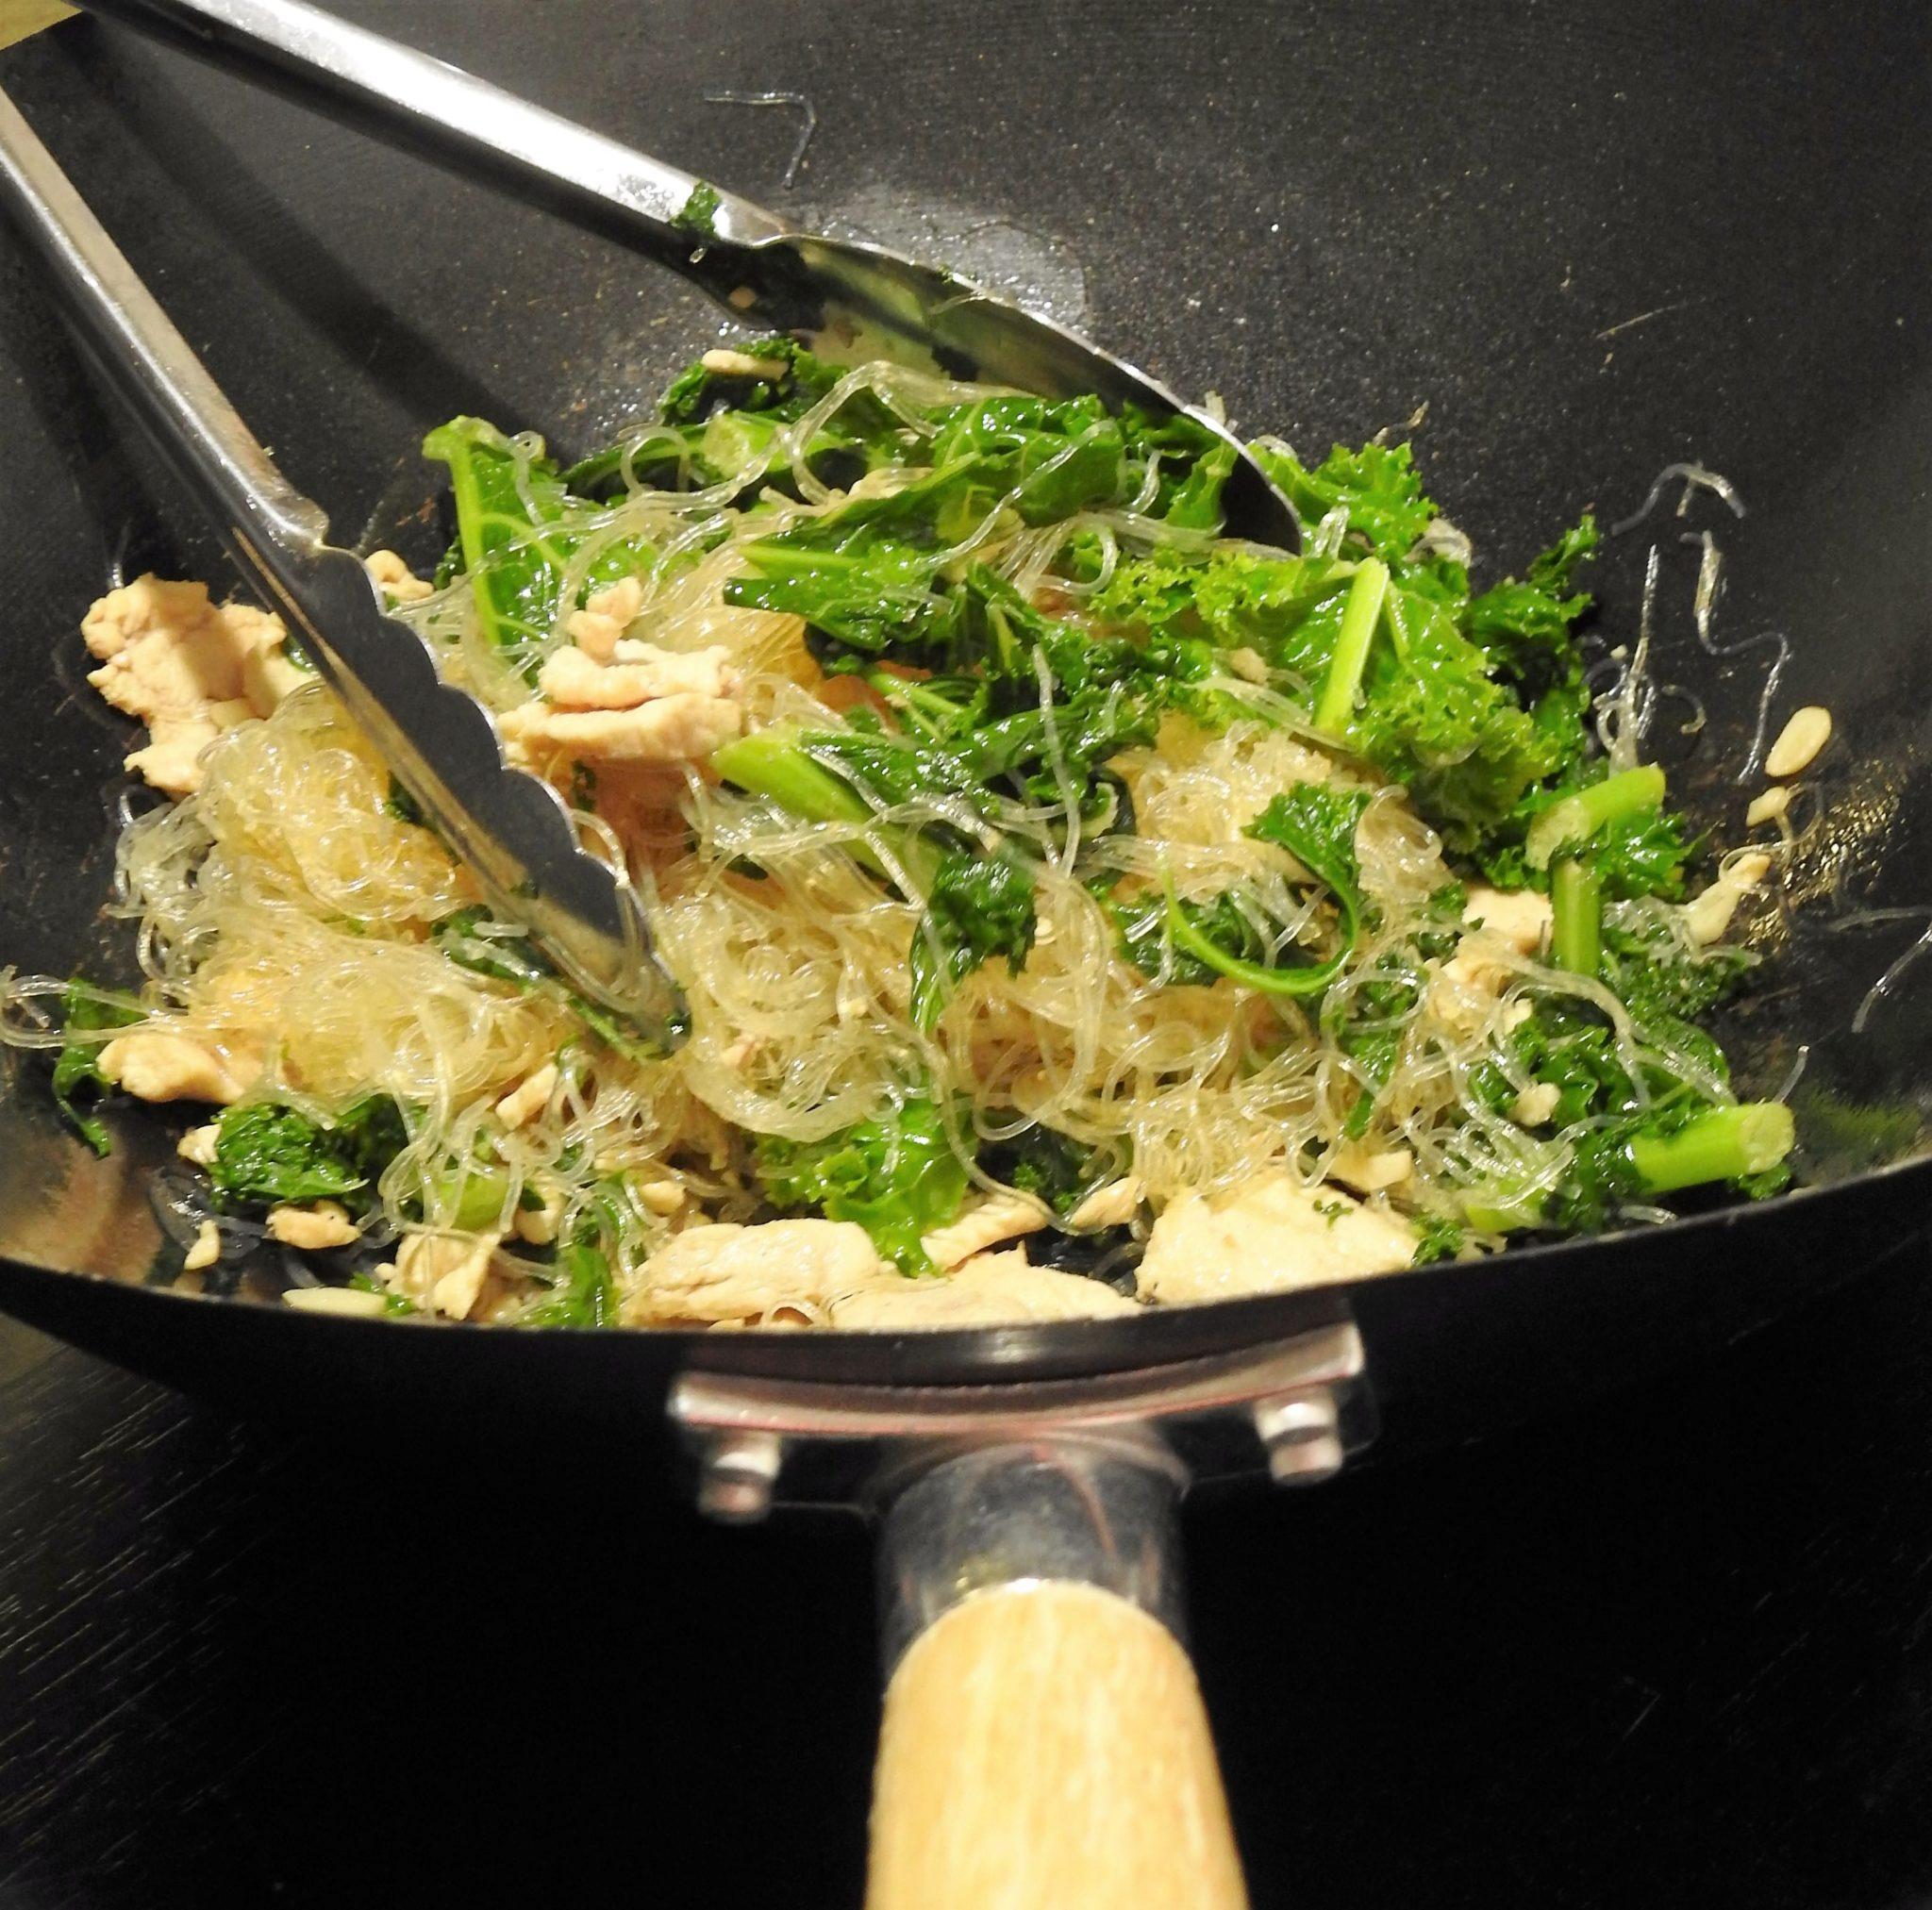 Kale Stir Fried with Glass Noodles